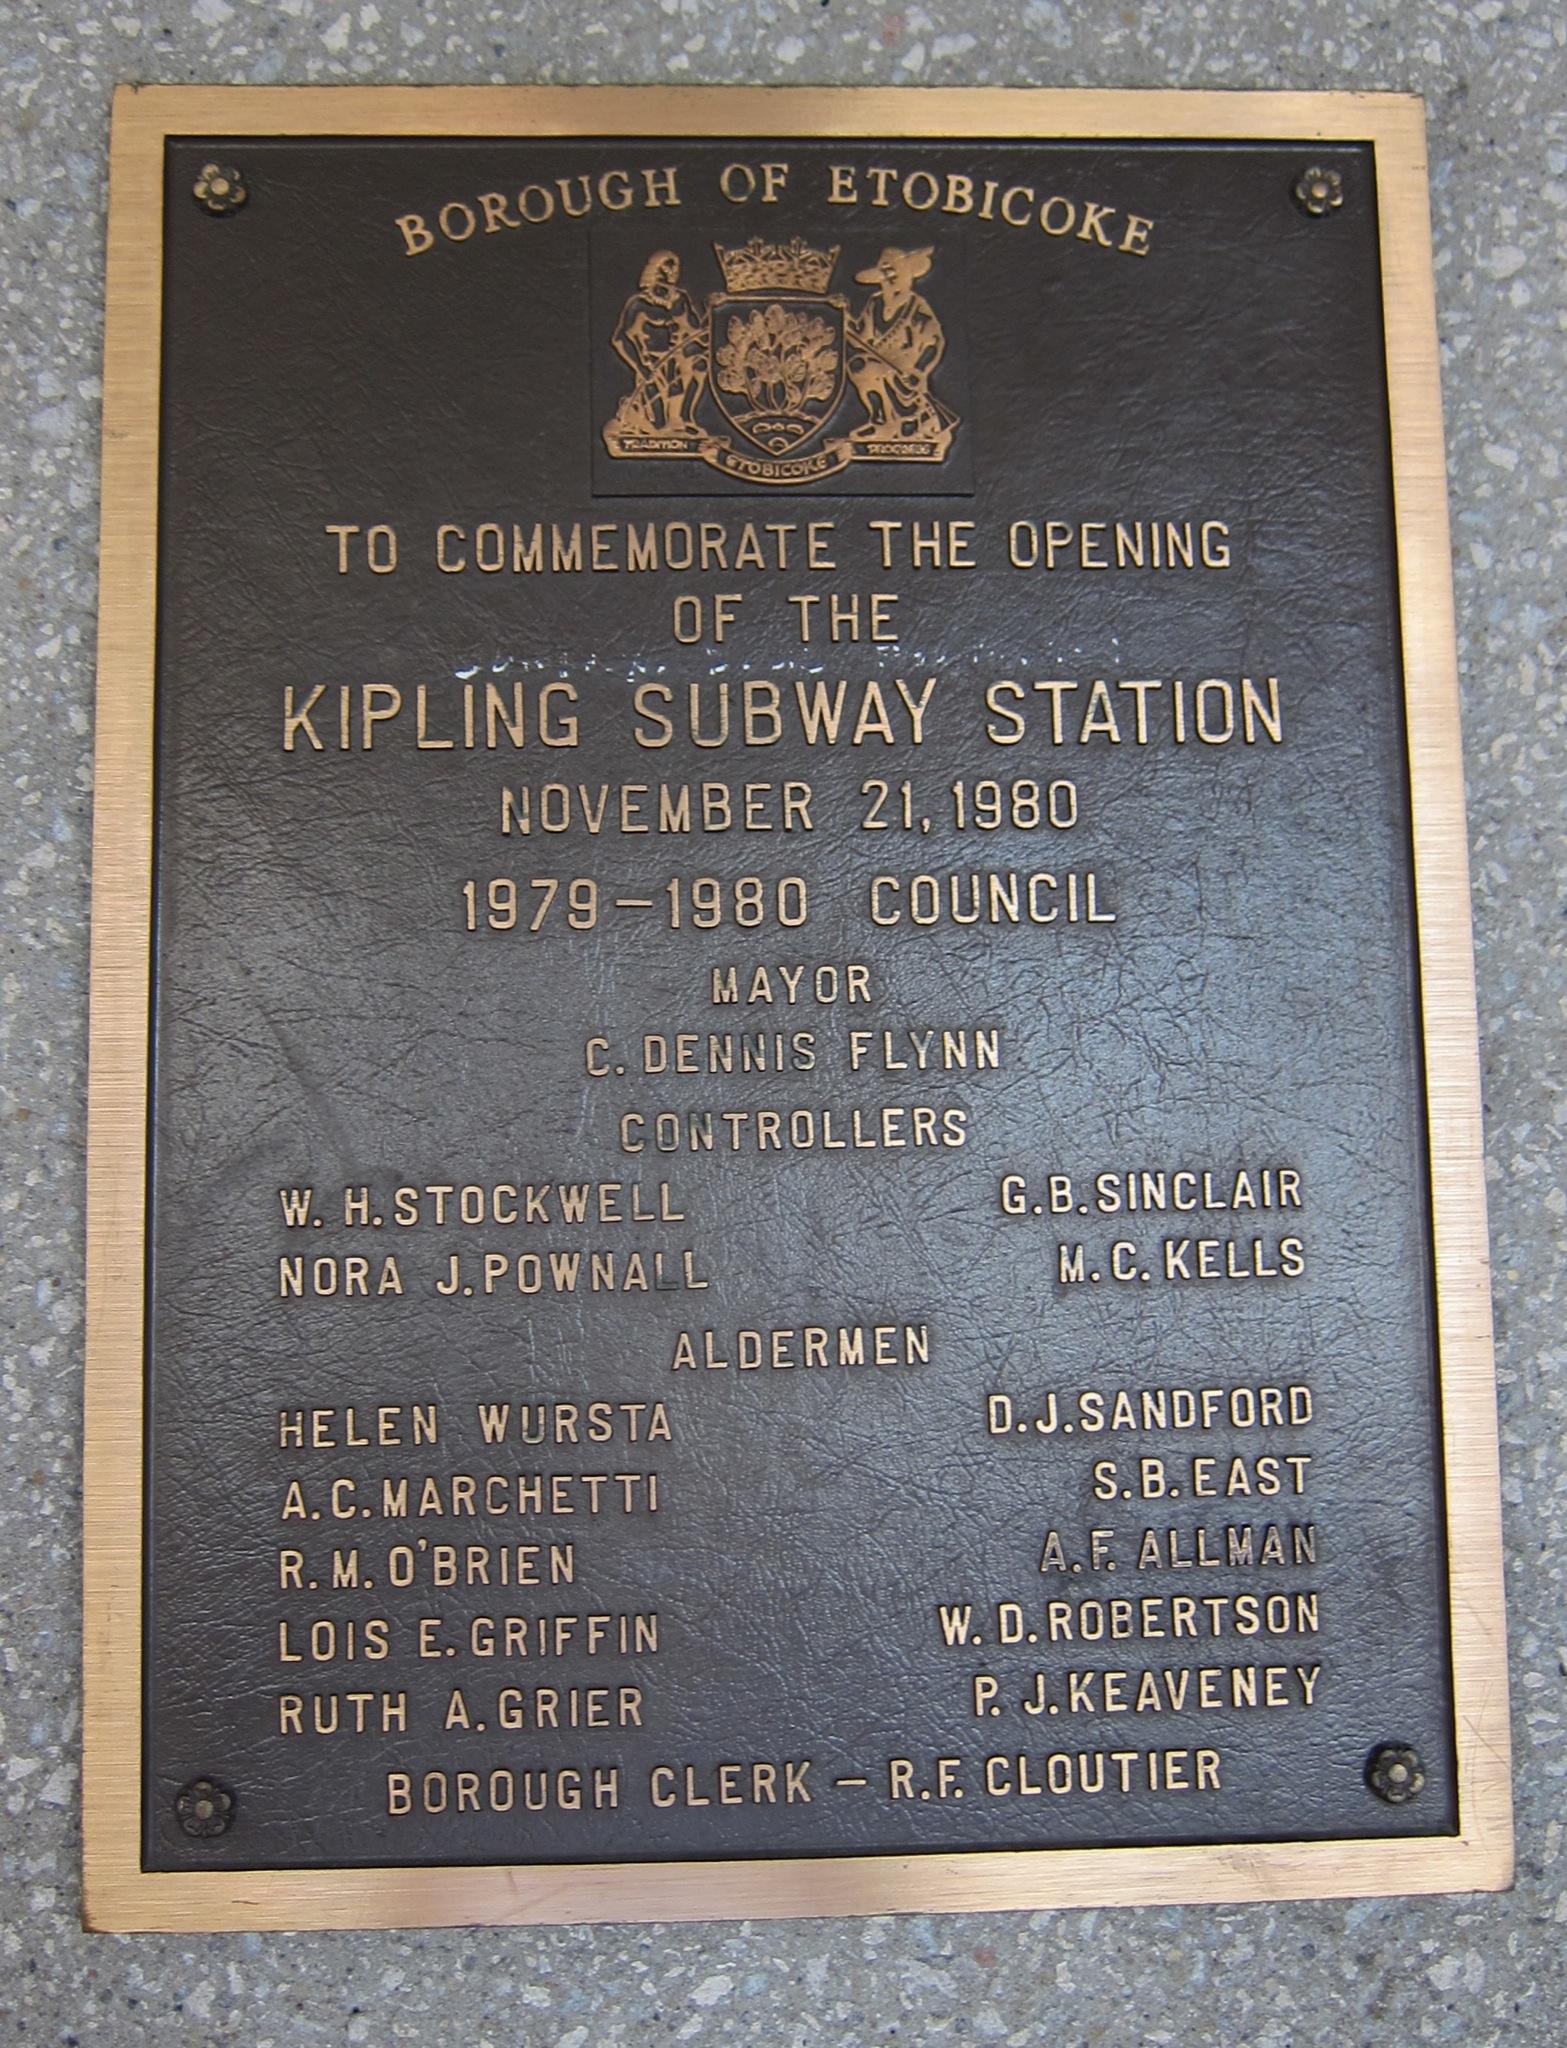 Photo: Commemorative plaque, bus platform level: Kipling station opened November 21, 1980. (open to the public Nov 22)